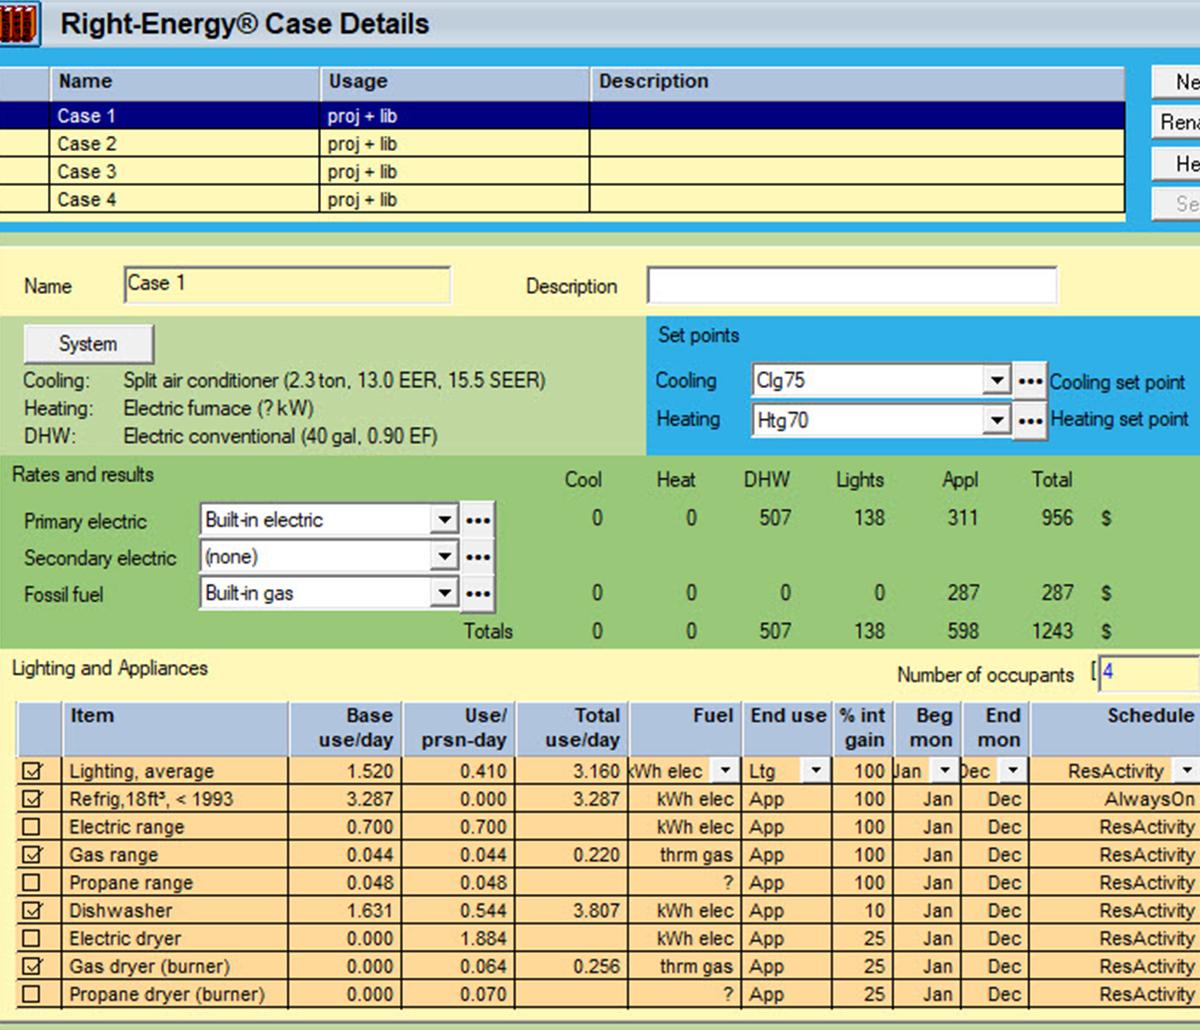 MiTek Wrightsoft Energy Use Analysis Software - Screenshot of Wrightsoft energy use software